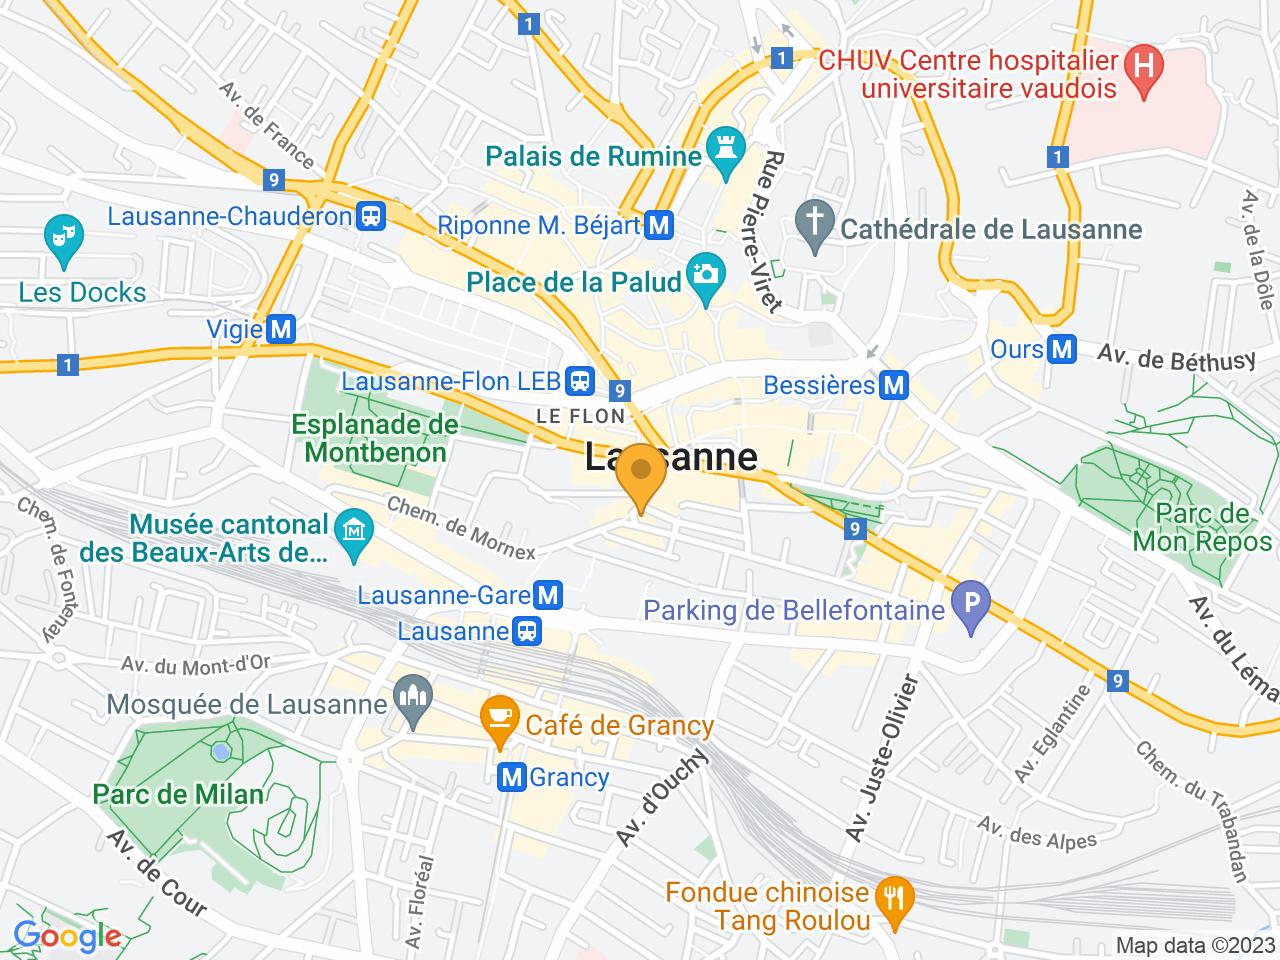 Rue du Midi 2, 1003 Lausanne